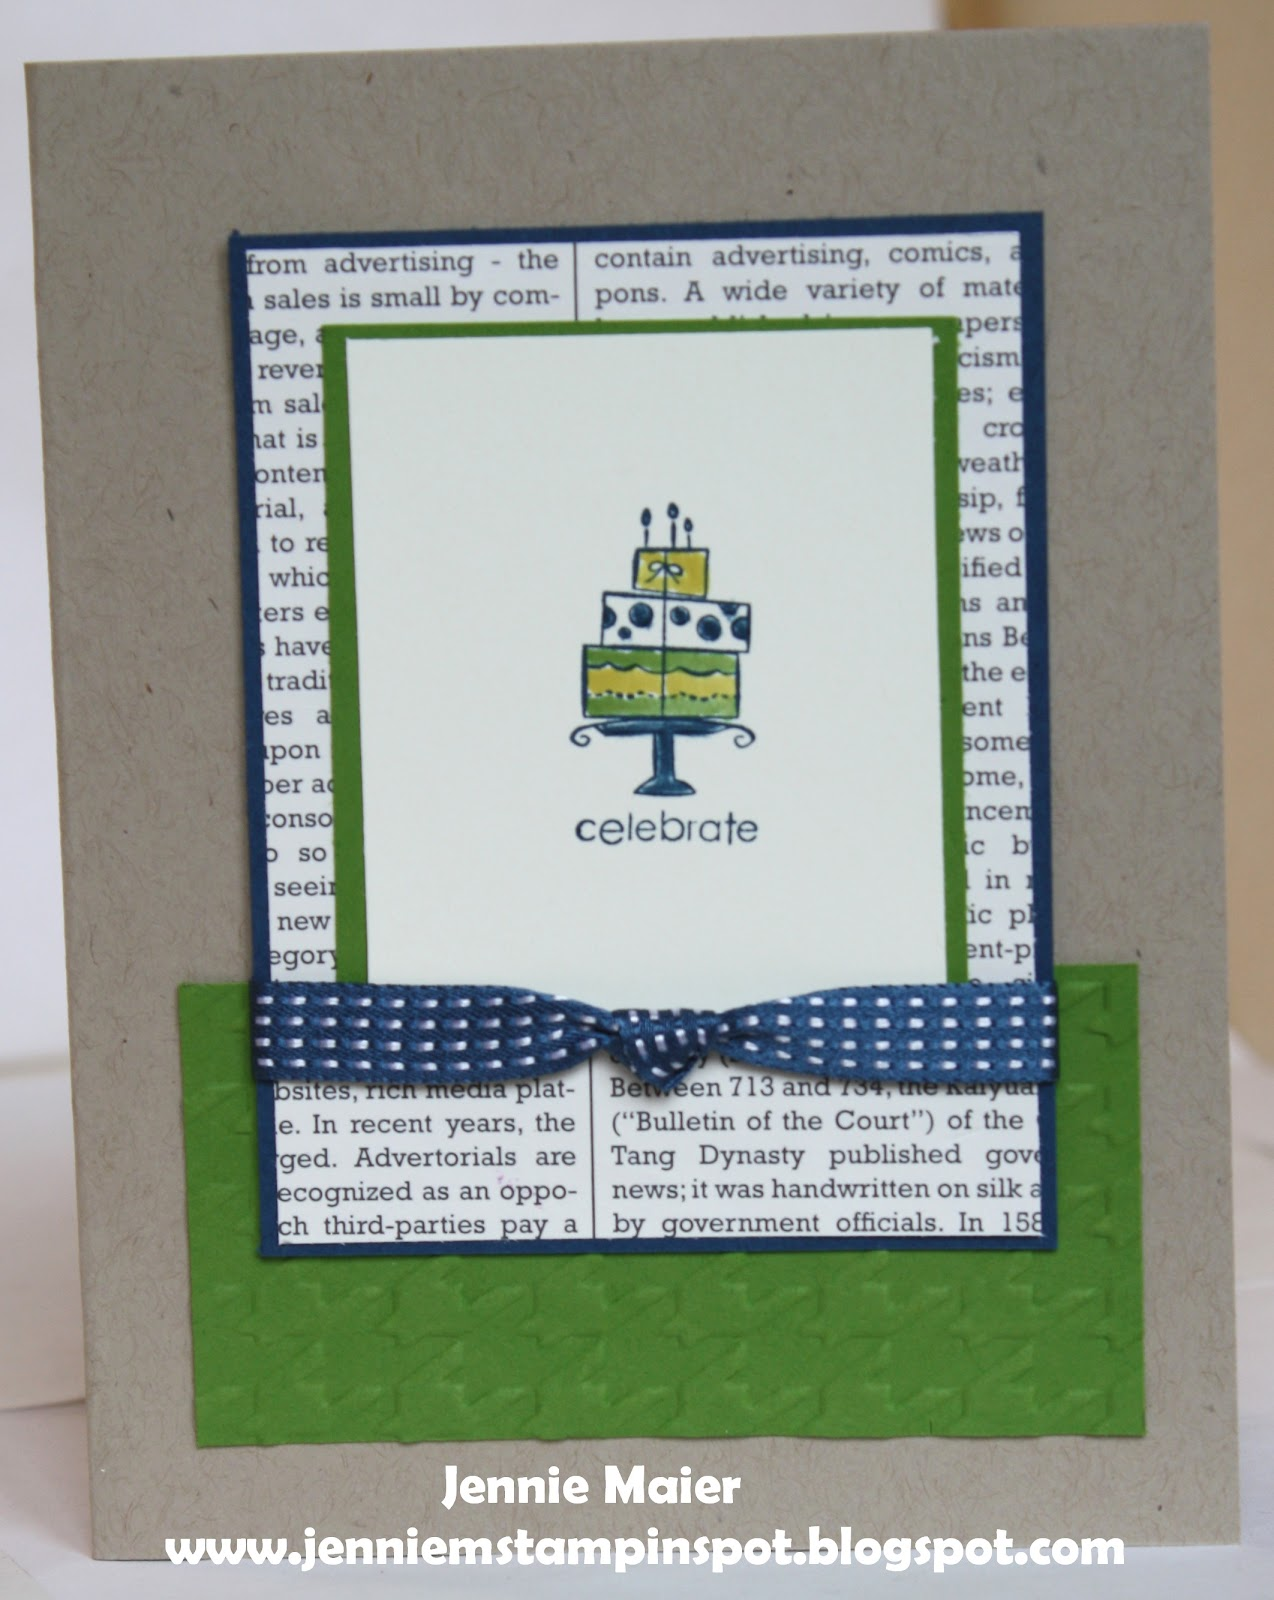 jennie m 39 s stampin spot masculine birthday card for a sketch. Black Bedroom Furniture Sets. Home Design Ideas